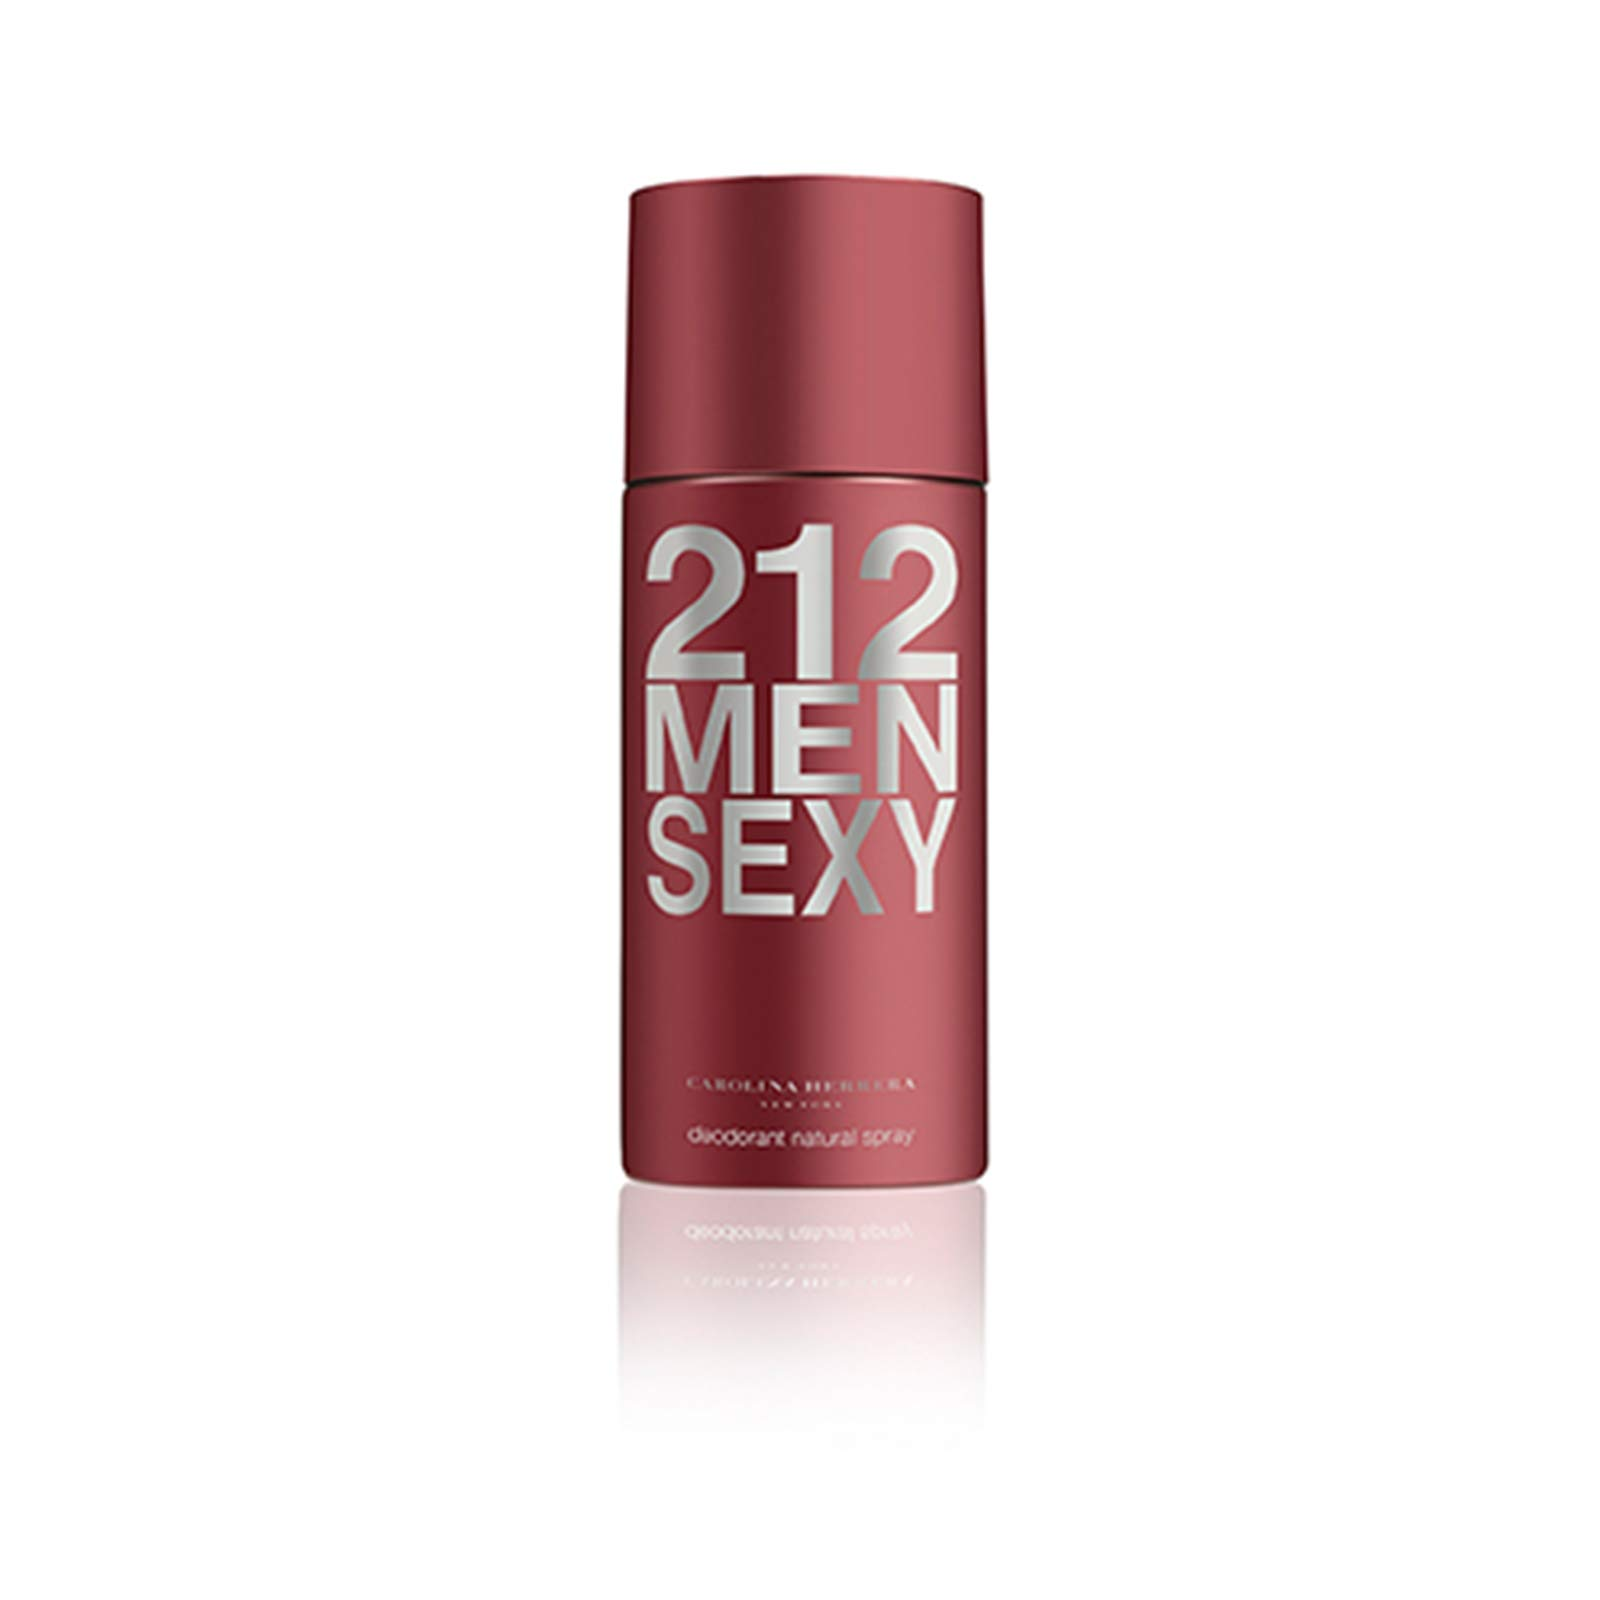 212 Sexy by Carolina Herrera for Men. Deodorant Spray 5-Ounces